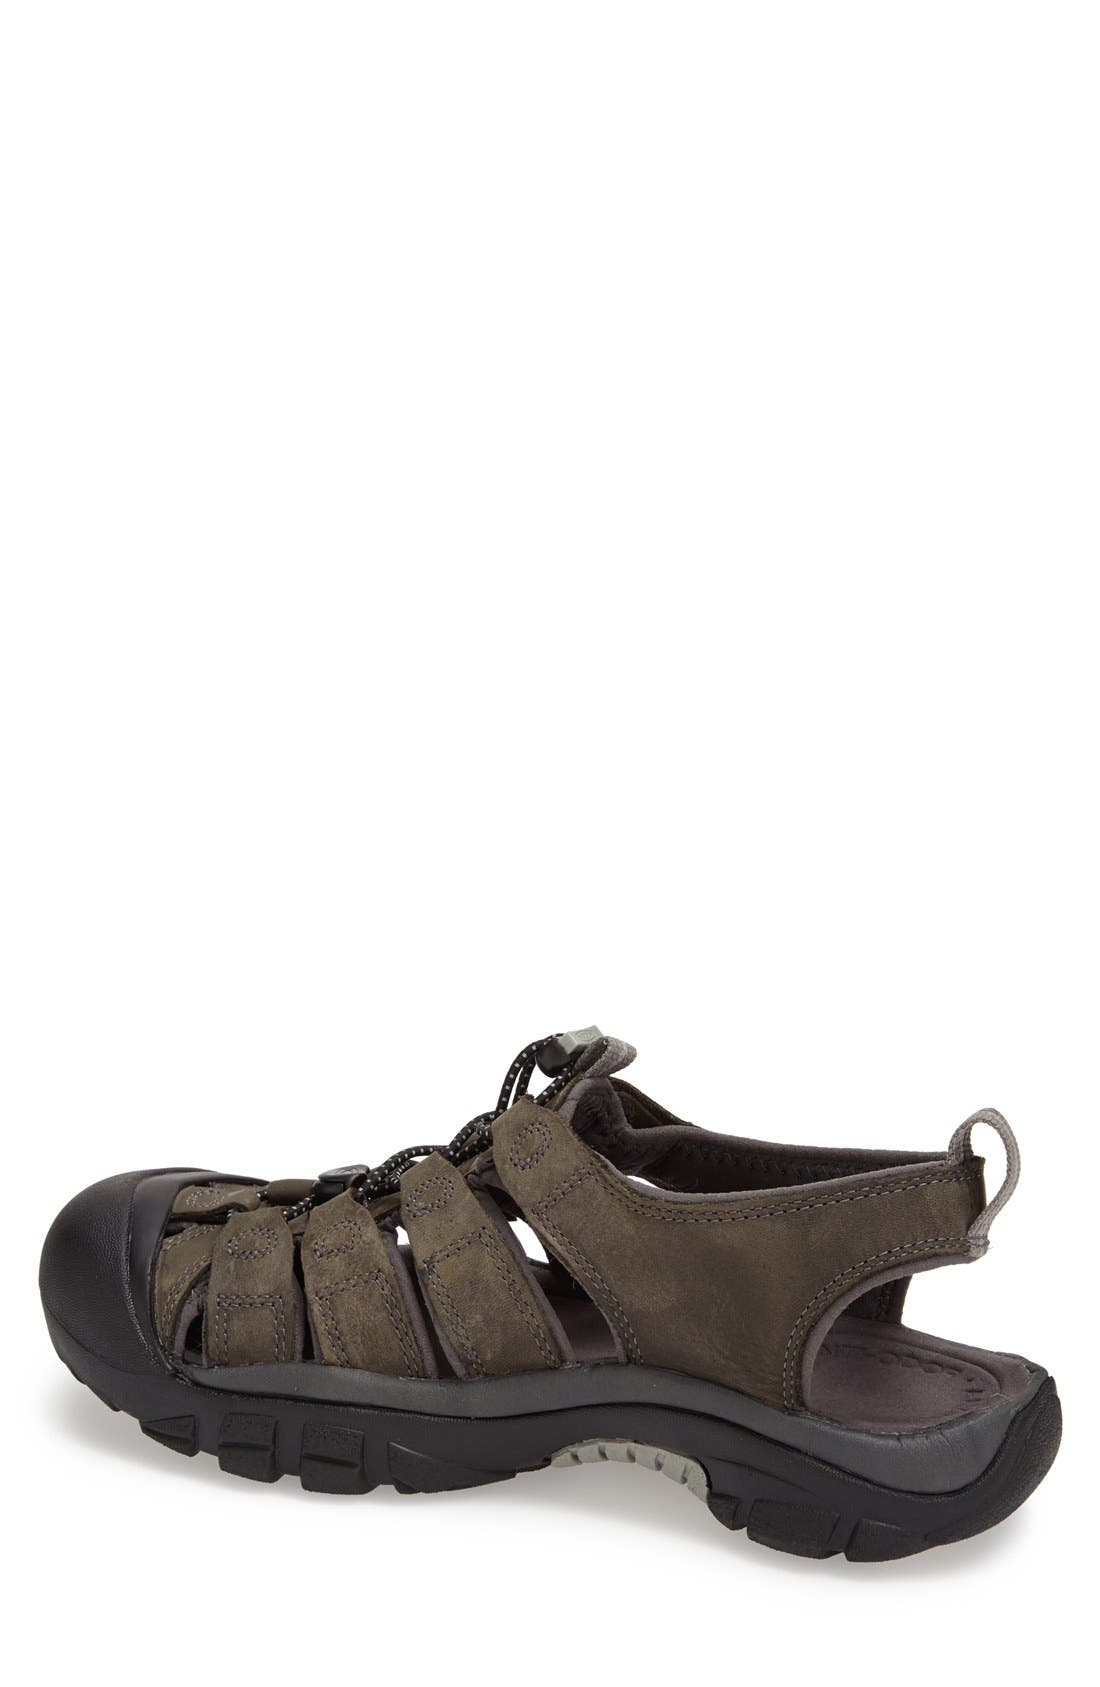 Alternate Image 2  - Keen 'Newport' Water Sandal (Men)